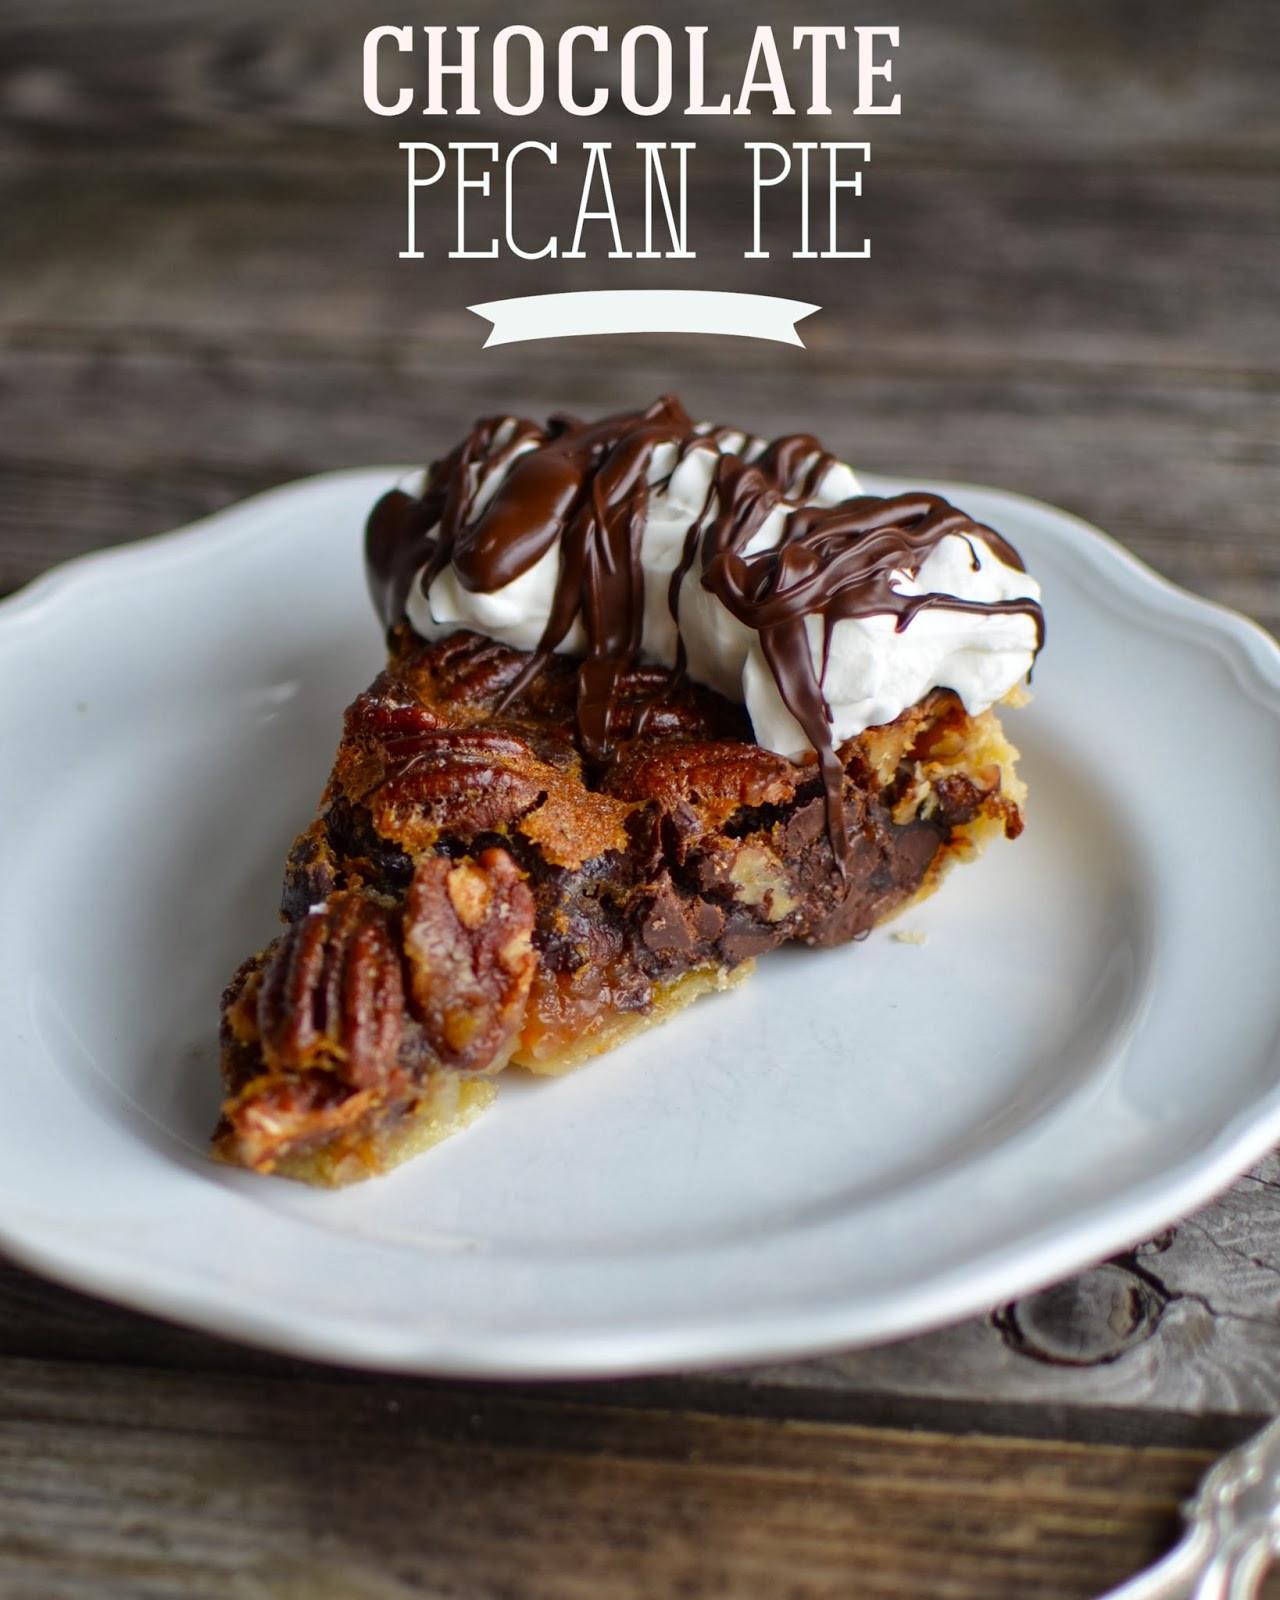 Chocolate Pecan Pie  Yammie s Noshery Chocolate Pecan Pie